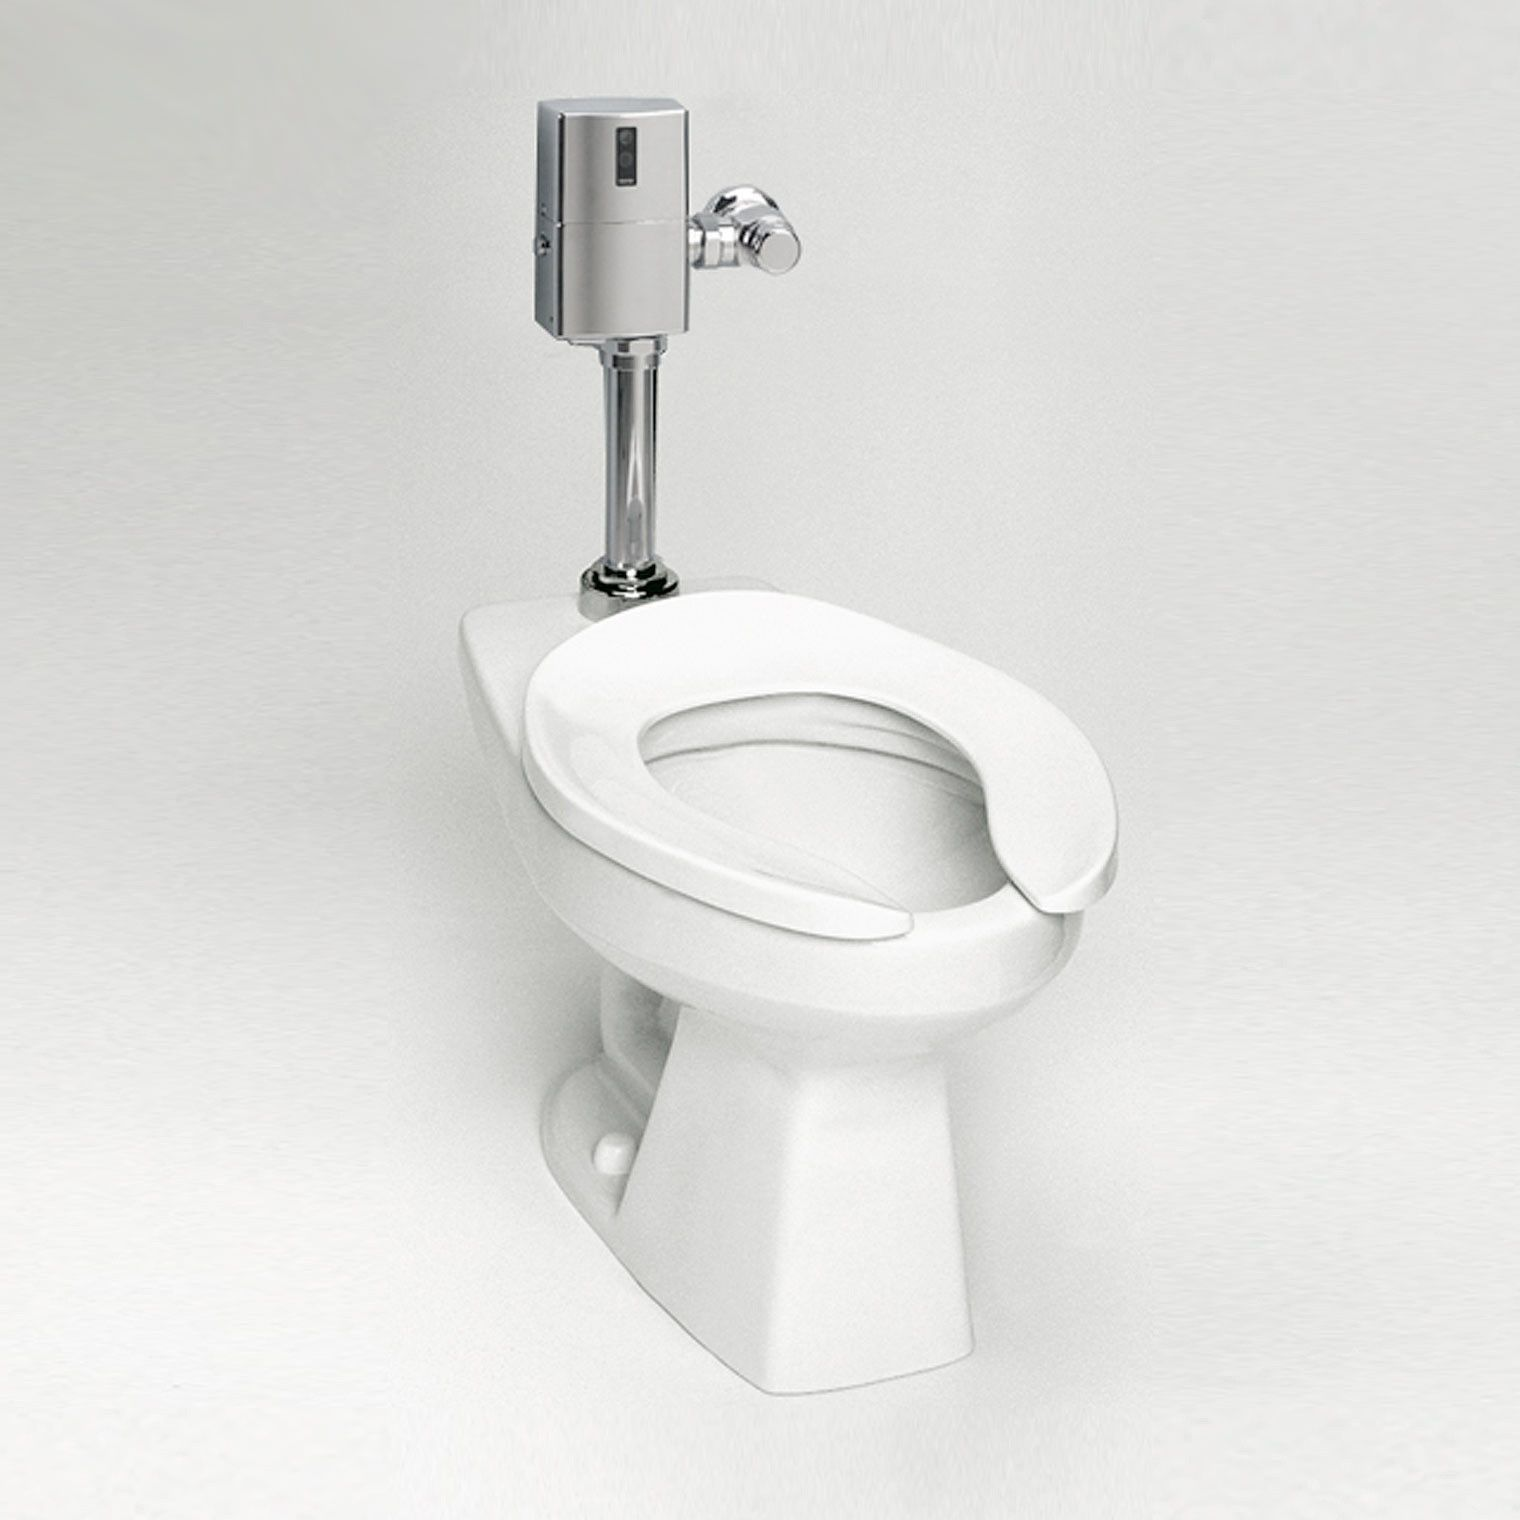 Toto Ct705en 01 Commercial Flushometer High Efficiency Toilet 1 28 Gpf Elongated Bowl Cotton White Mega Supply Store Toilet Flush Valves Toto